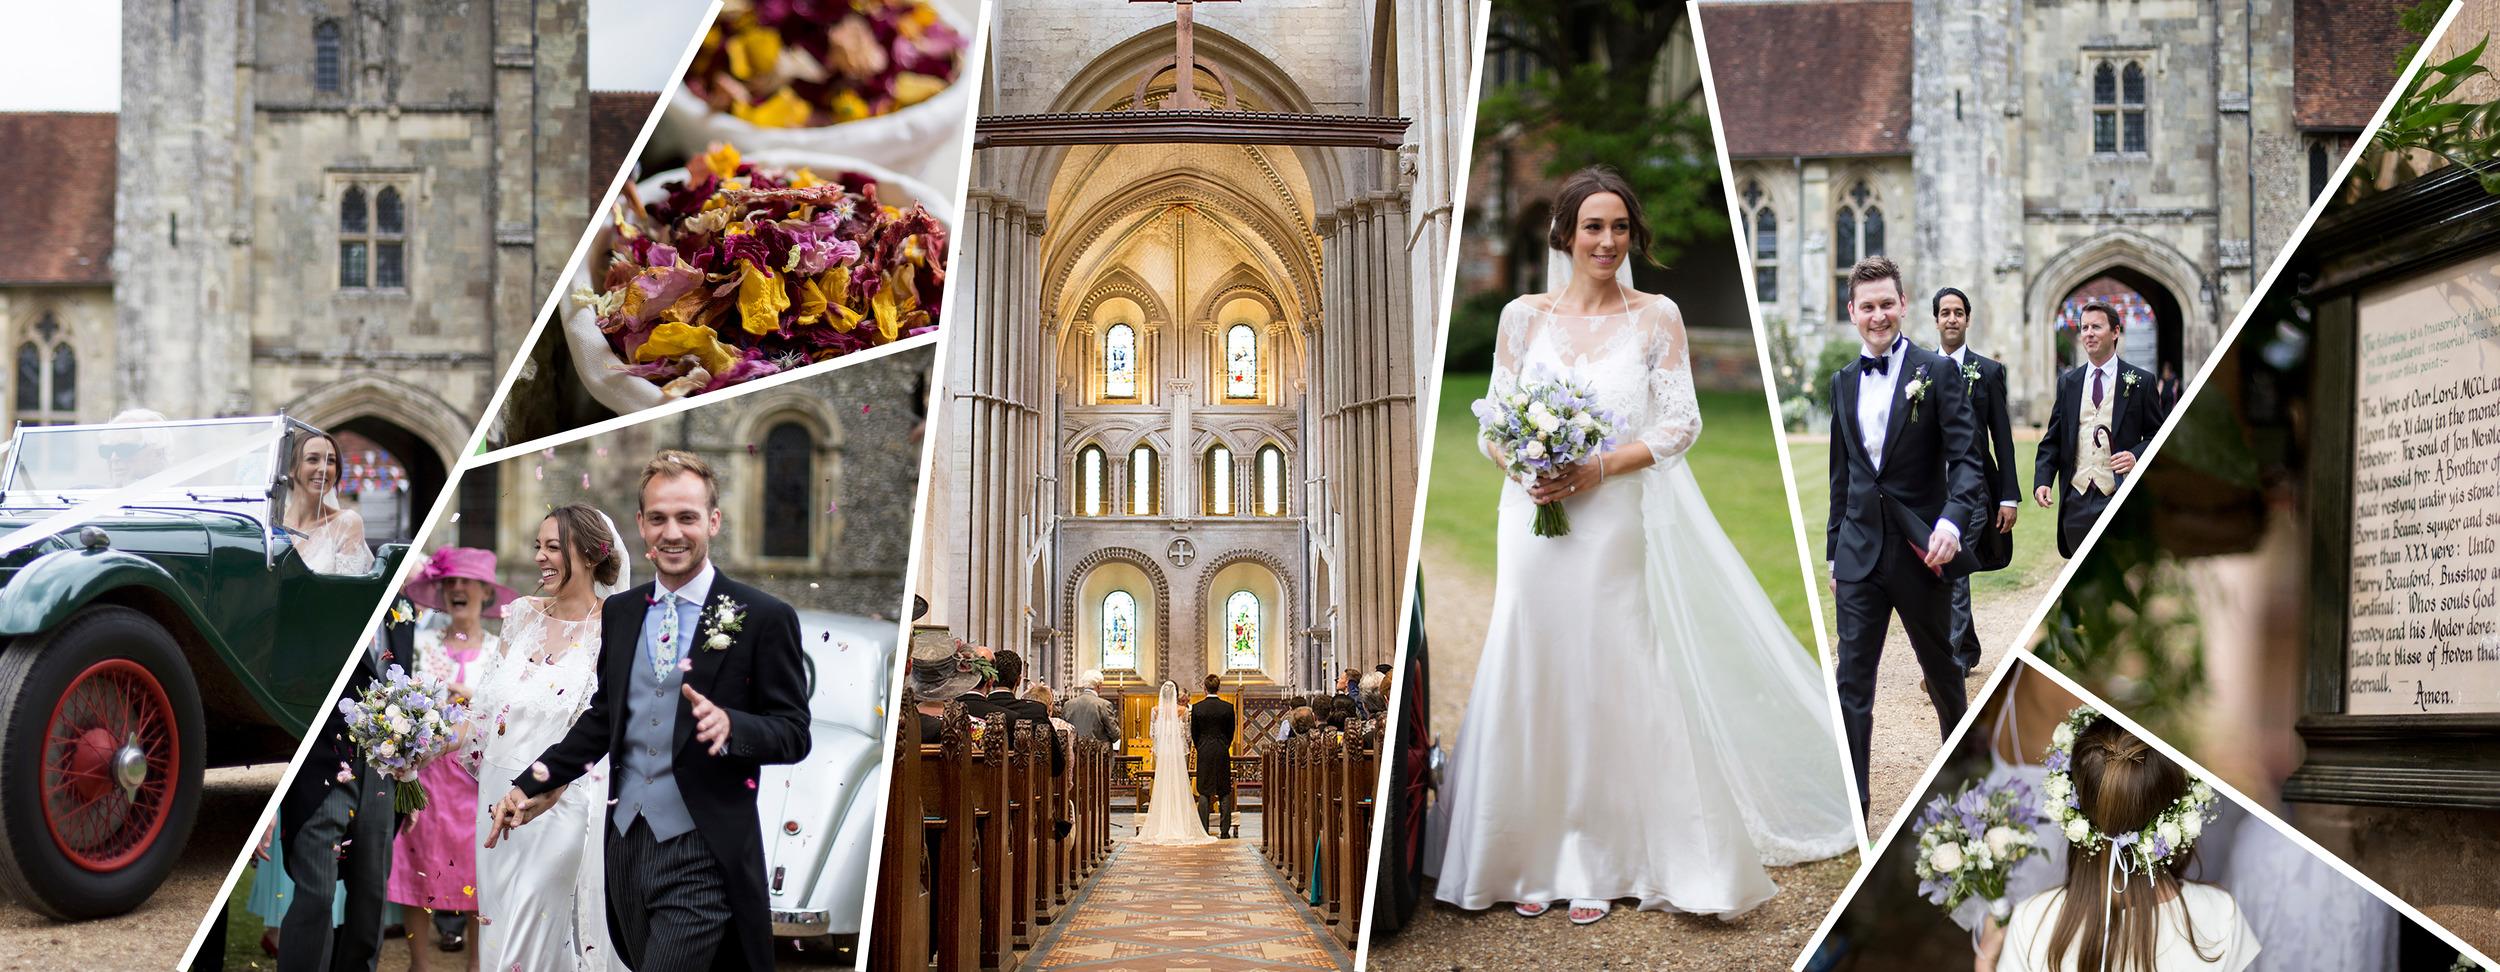 St Cross Winchester wedding Photography